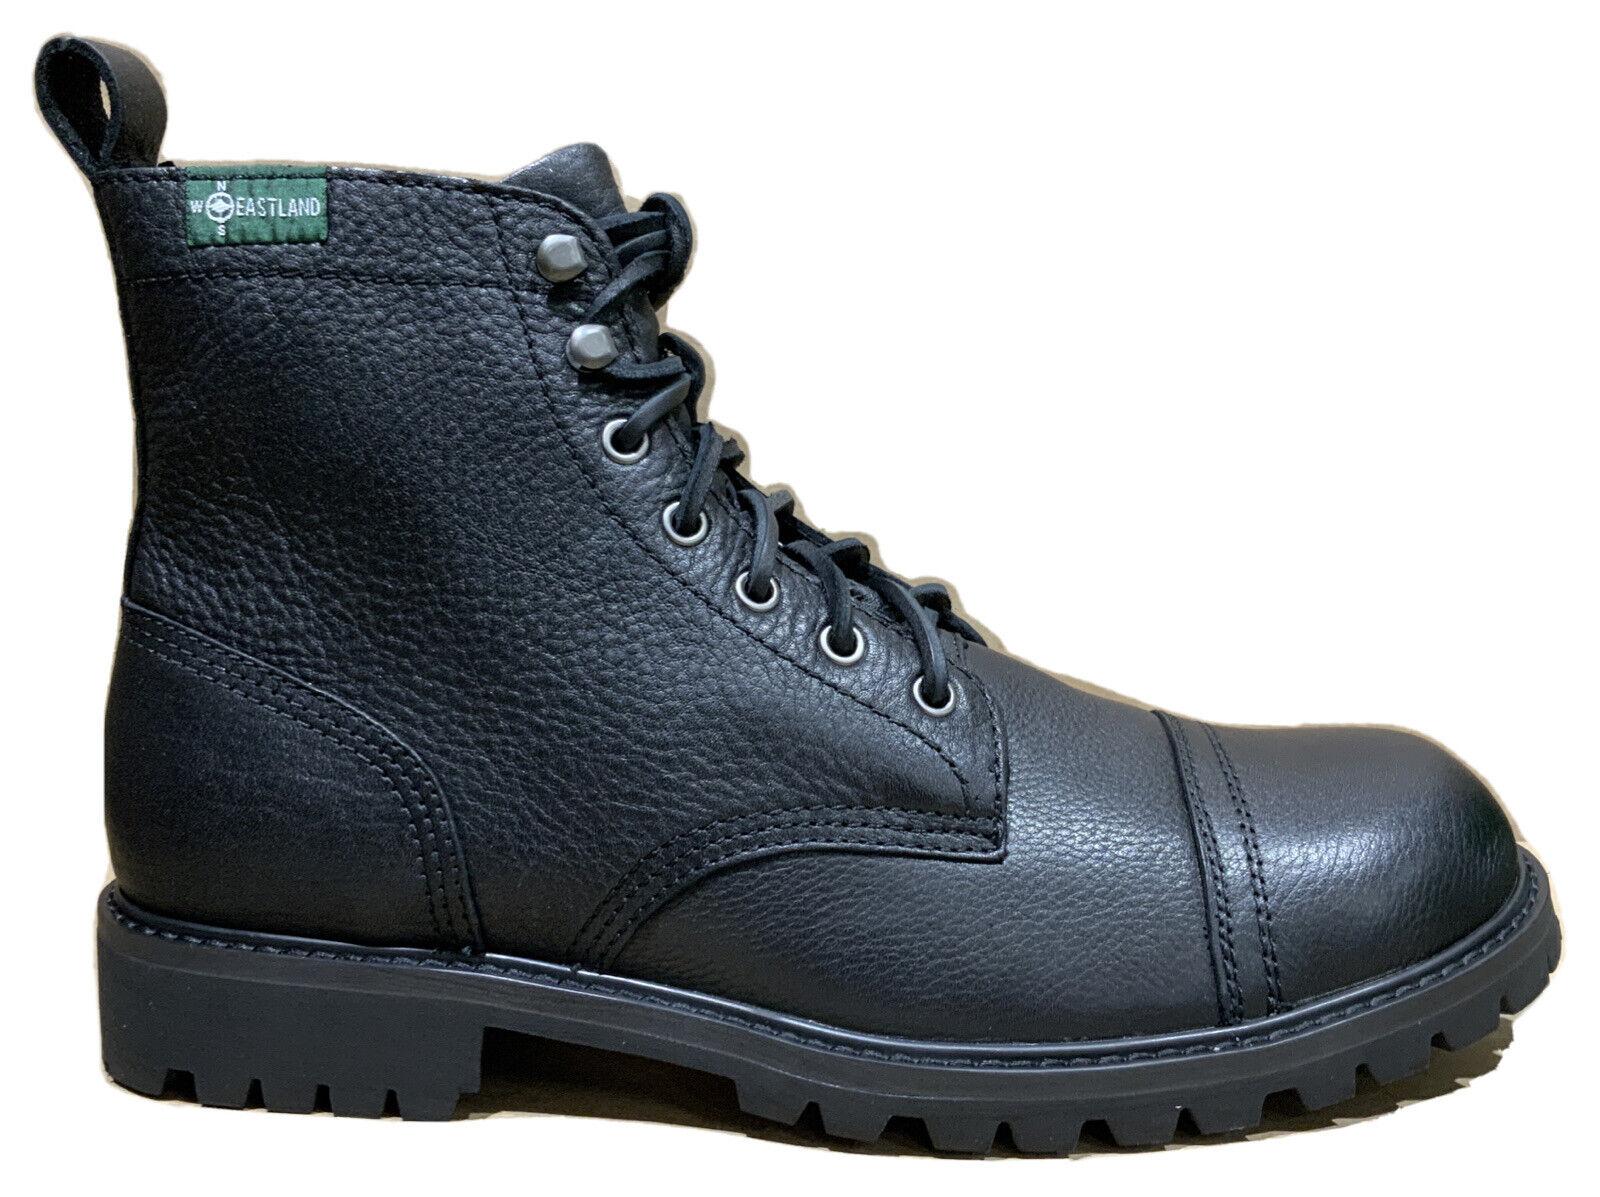 EASTLAND Ethan 1955 Black 7019-01D Men's Leather Boots size 11.5 Medium